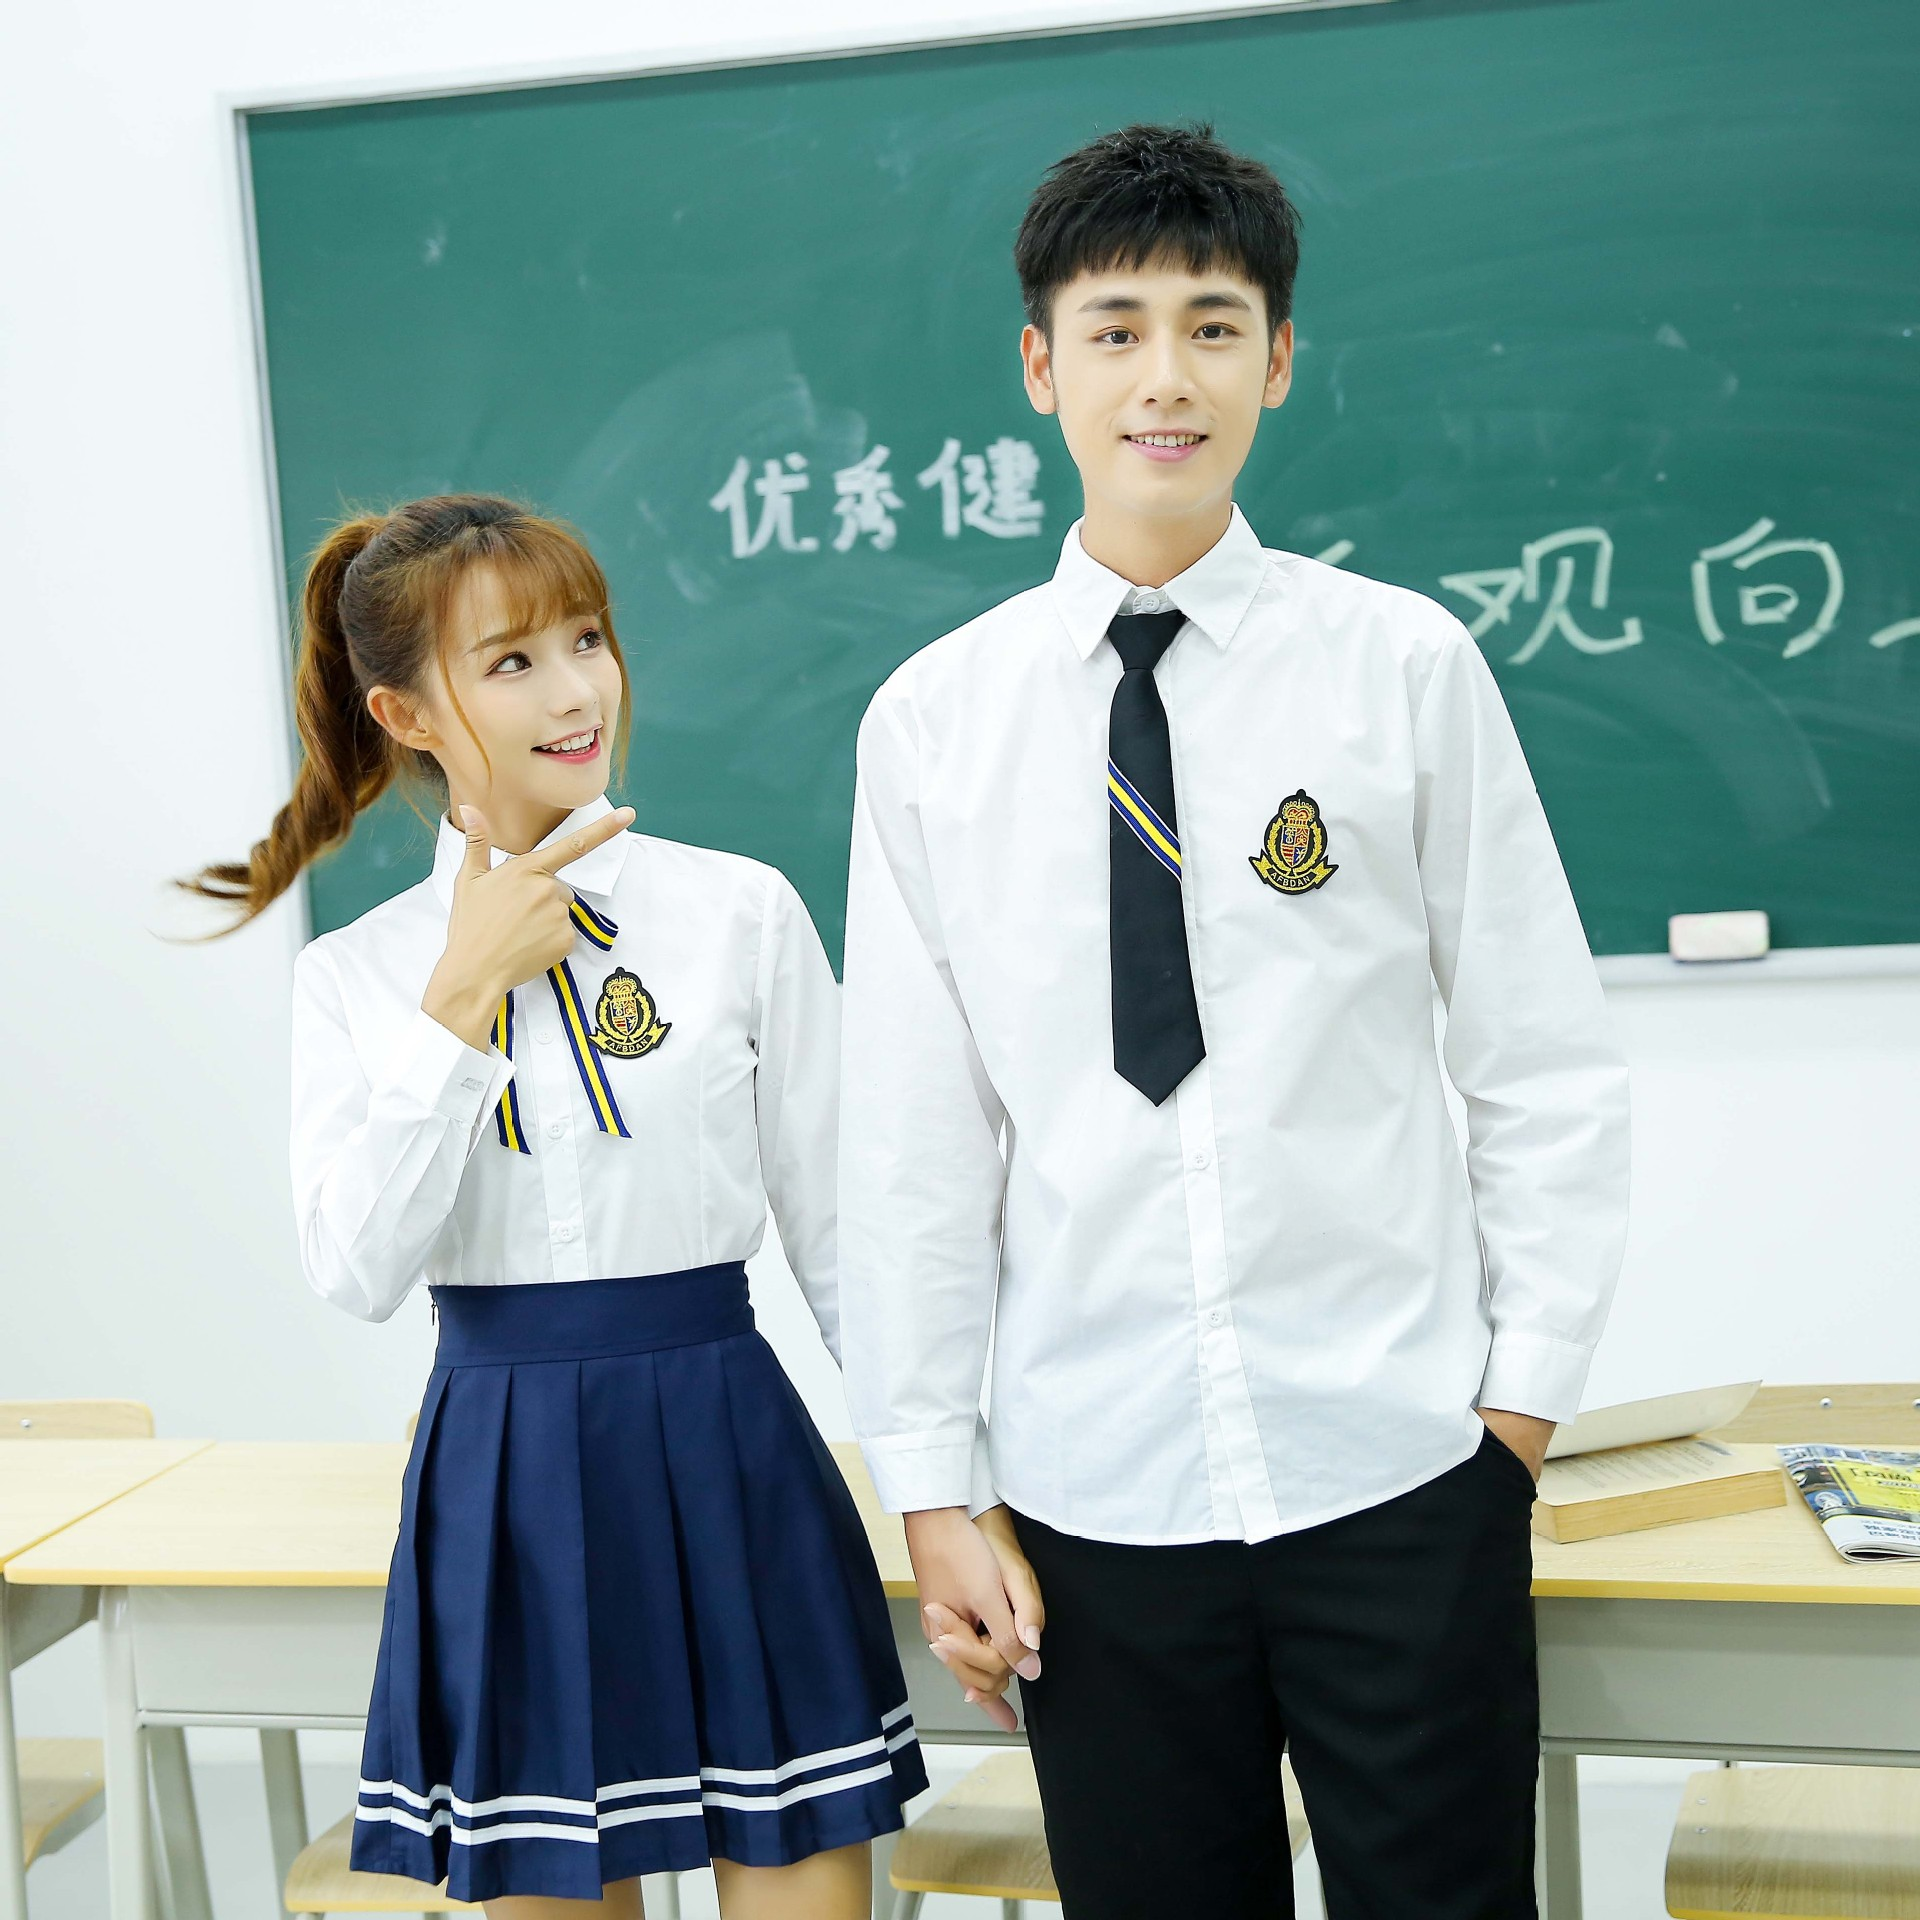 Spring new British college Fengchu high school student uniform graduation class uniform JK uniform shirt suit overalls